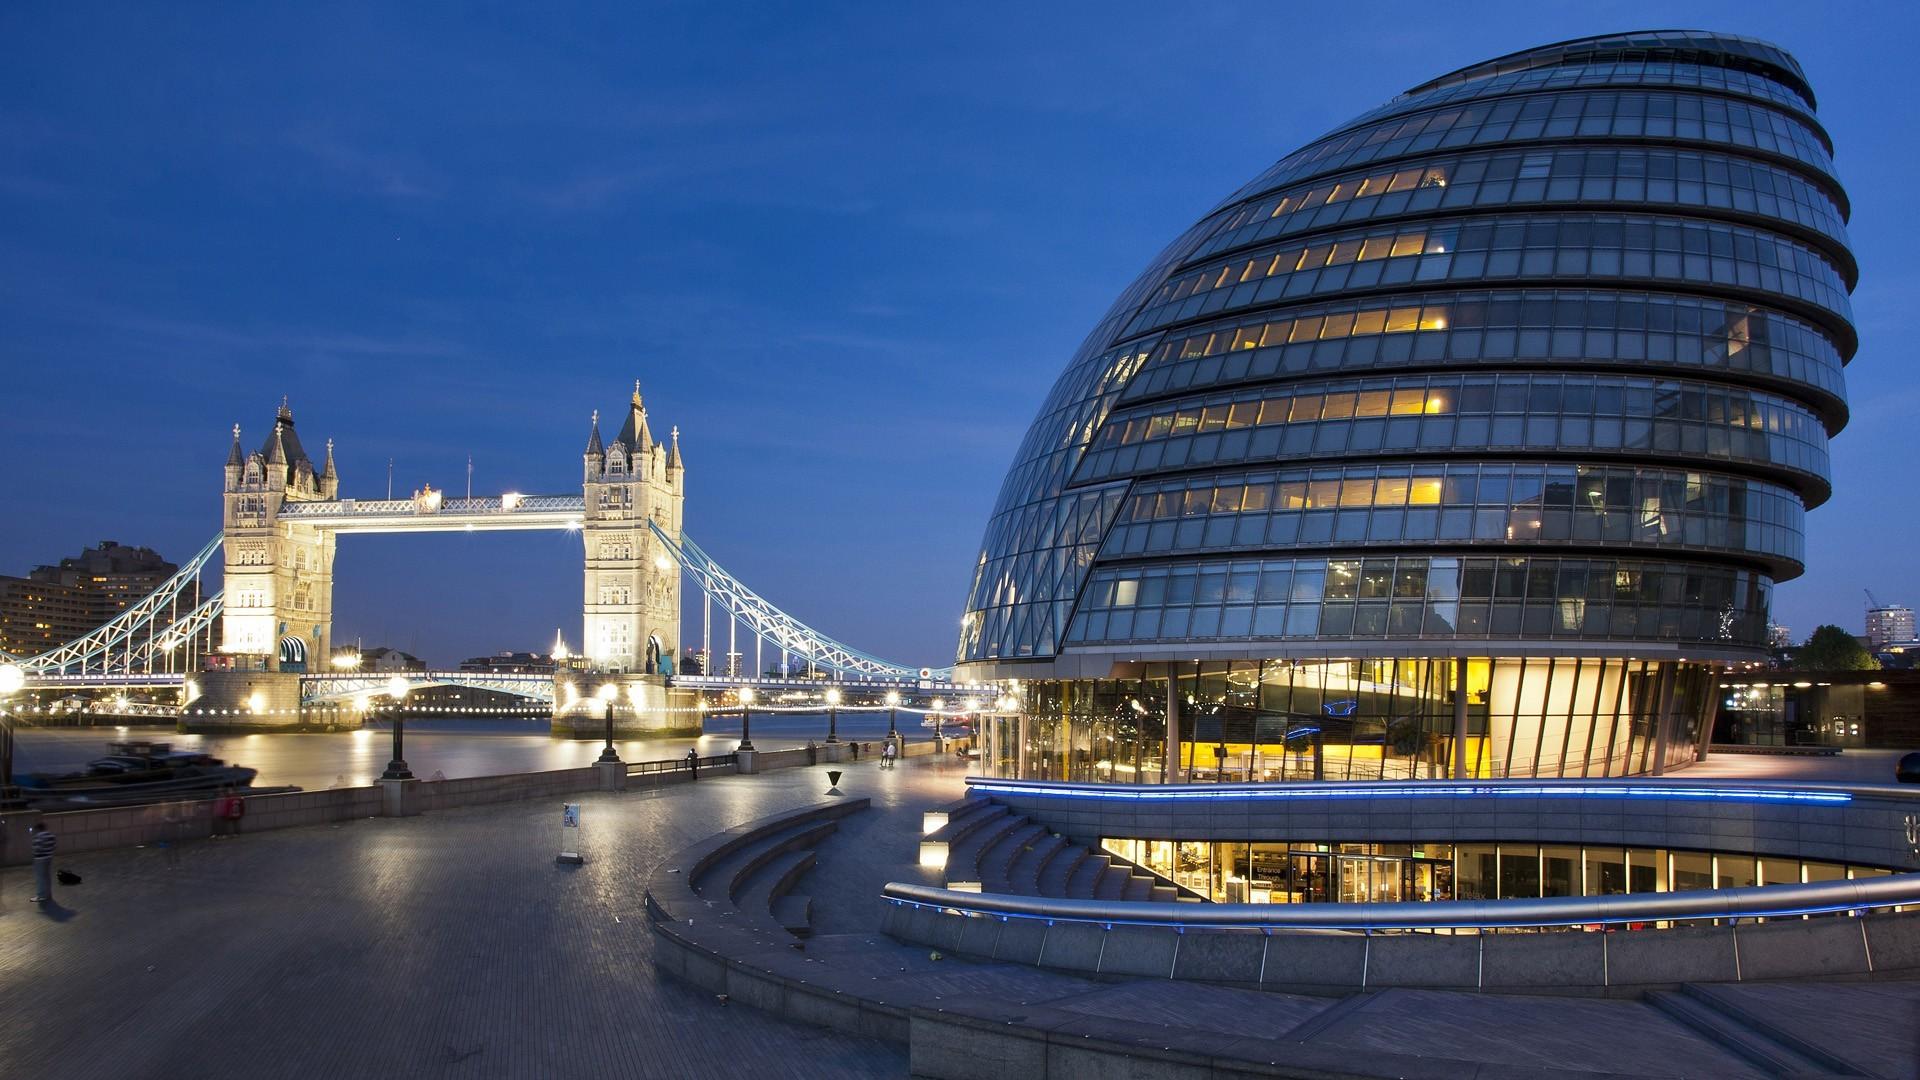 England London City Hall Tower Bridge Wallpaper - MixHD wallpapers